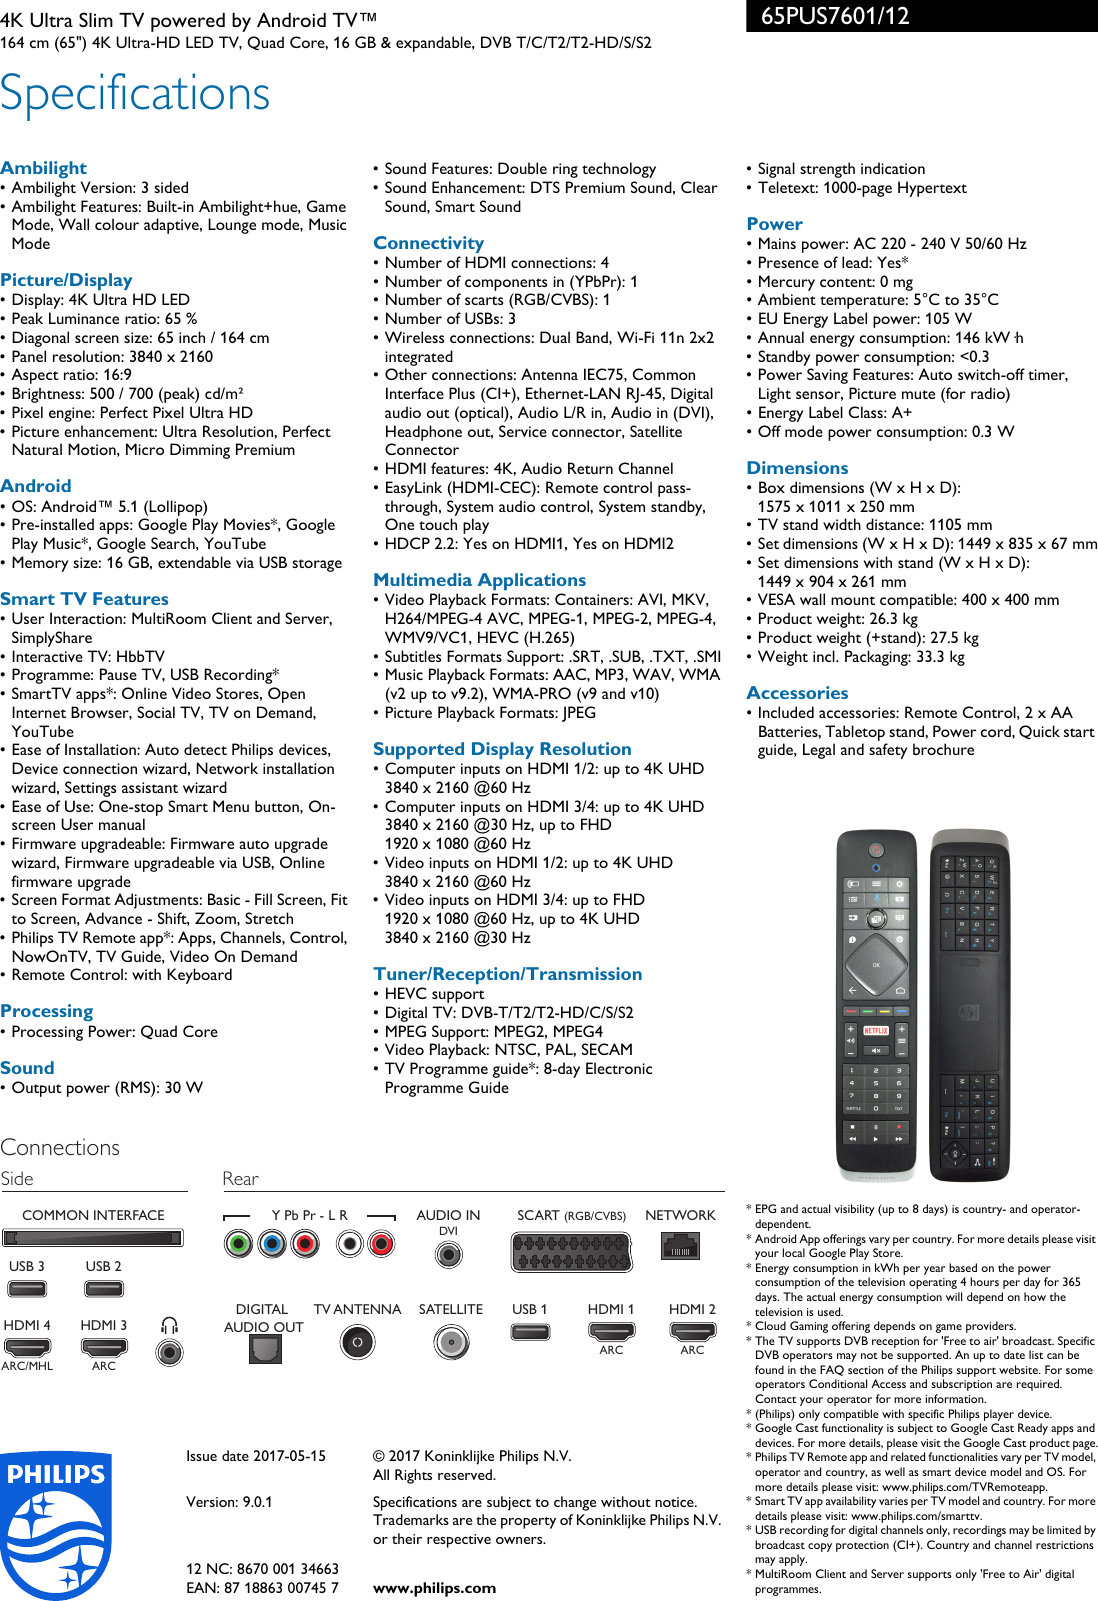 Philips 65PUS7601/12 Leaflet 65PUS7601_12 Released United